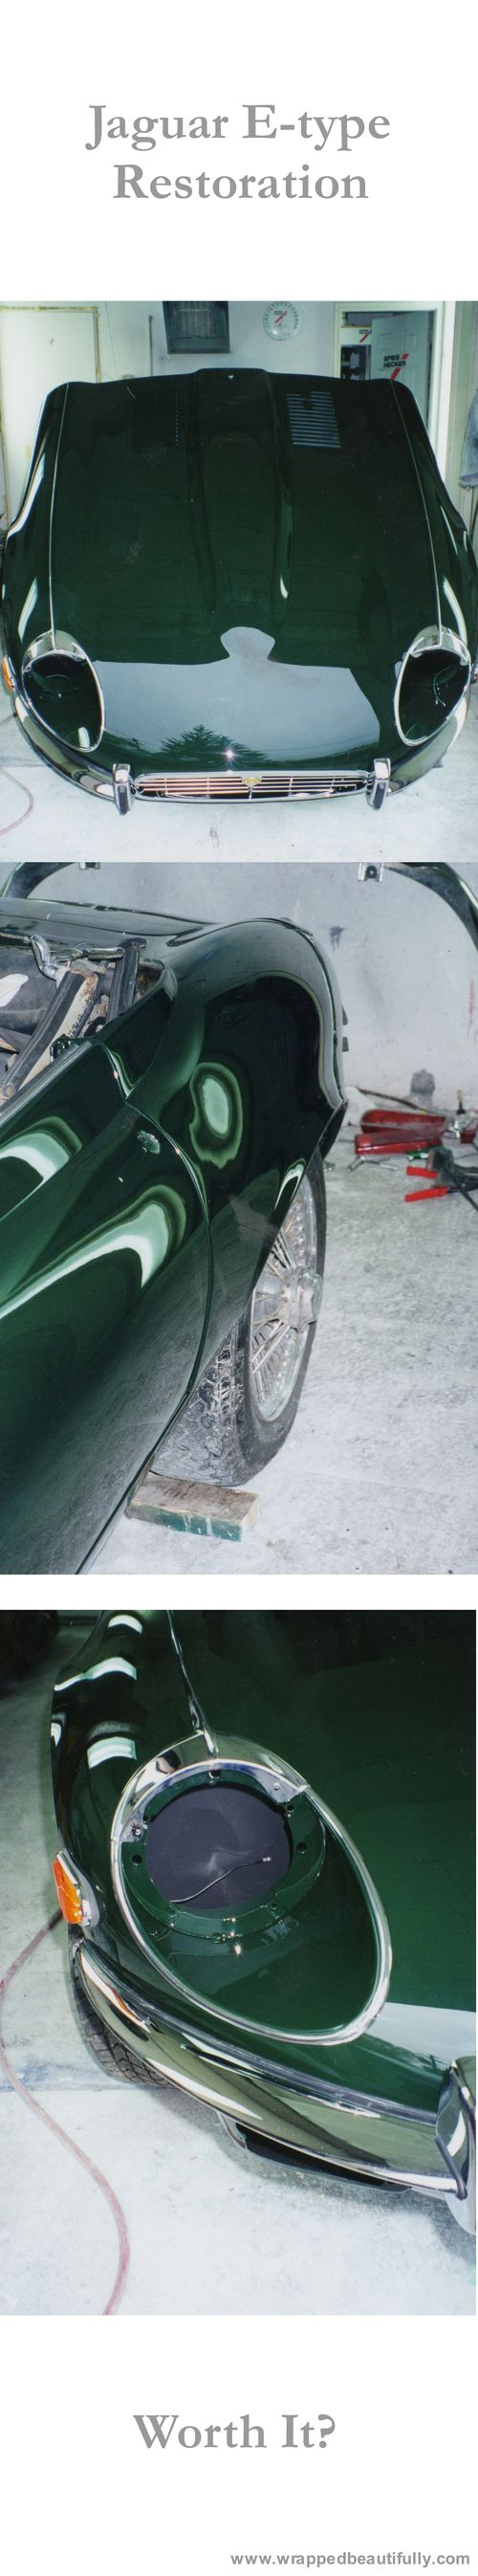 Jaguar-E-type-Restoration